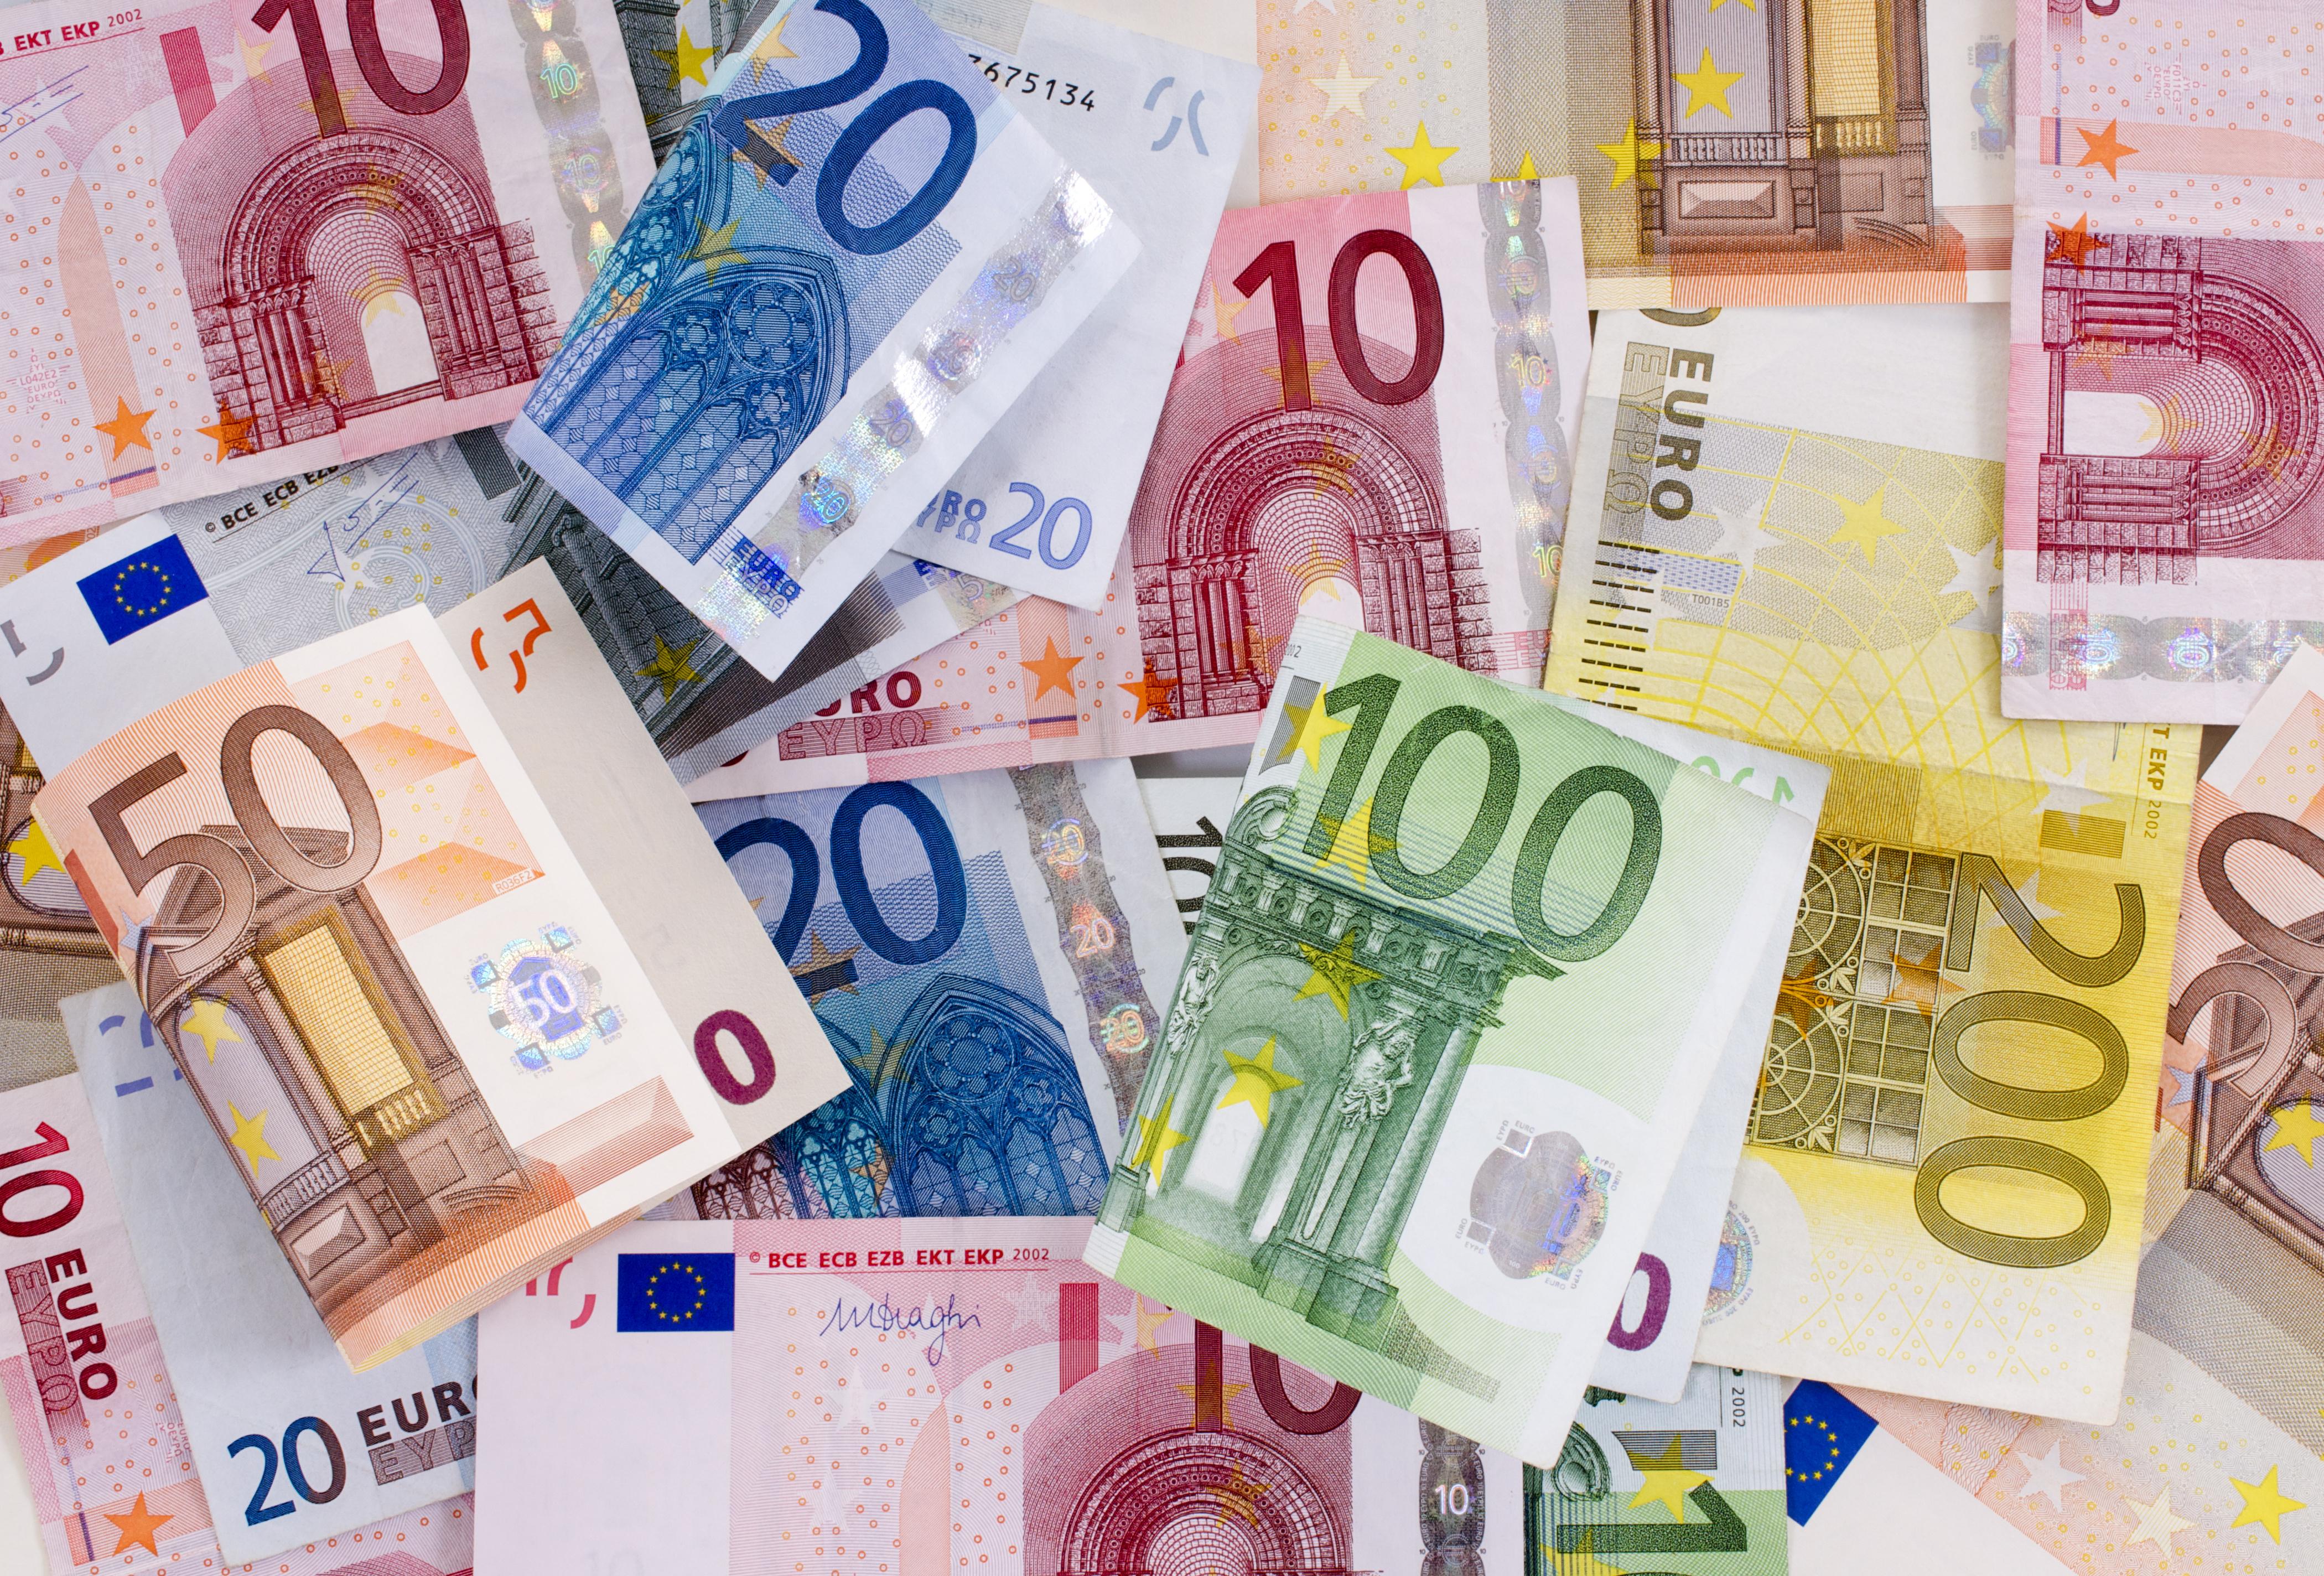 тех снимках, фото банкнот евро собрал